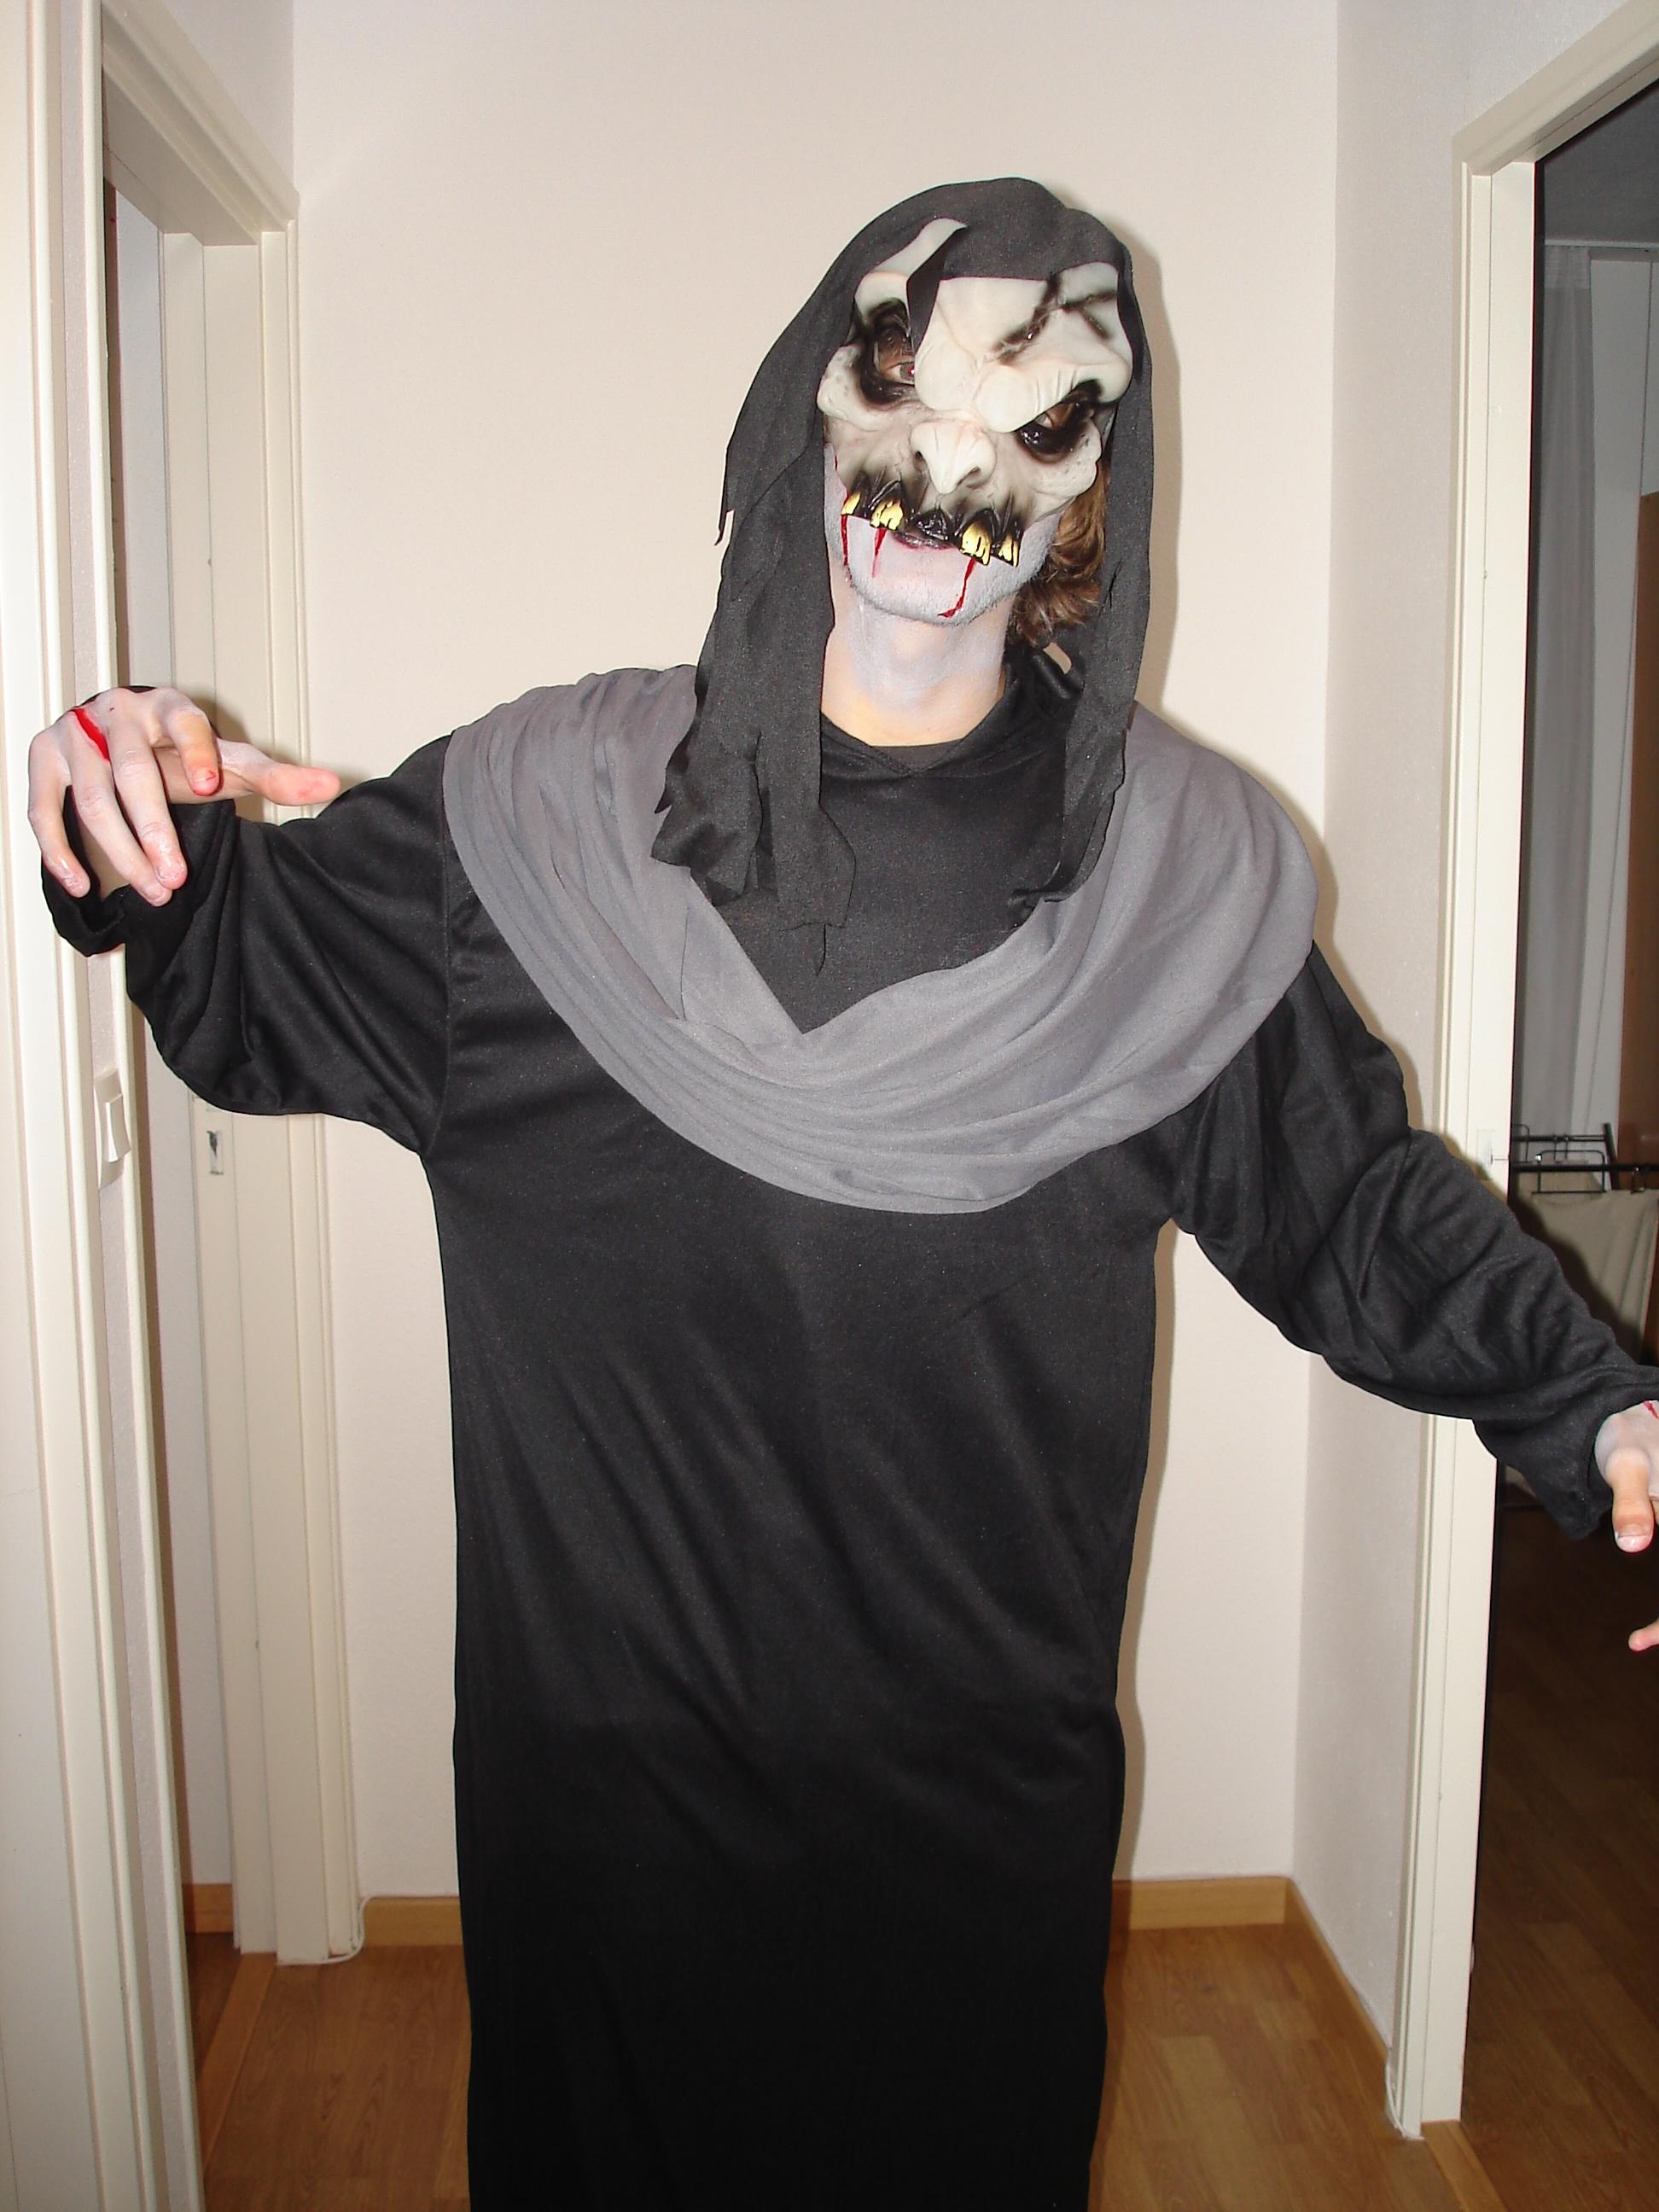 nicibg free fr diver Photo Halloween DSC03778 JPG